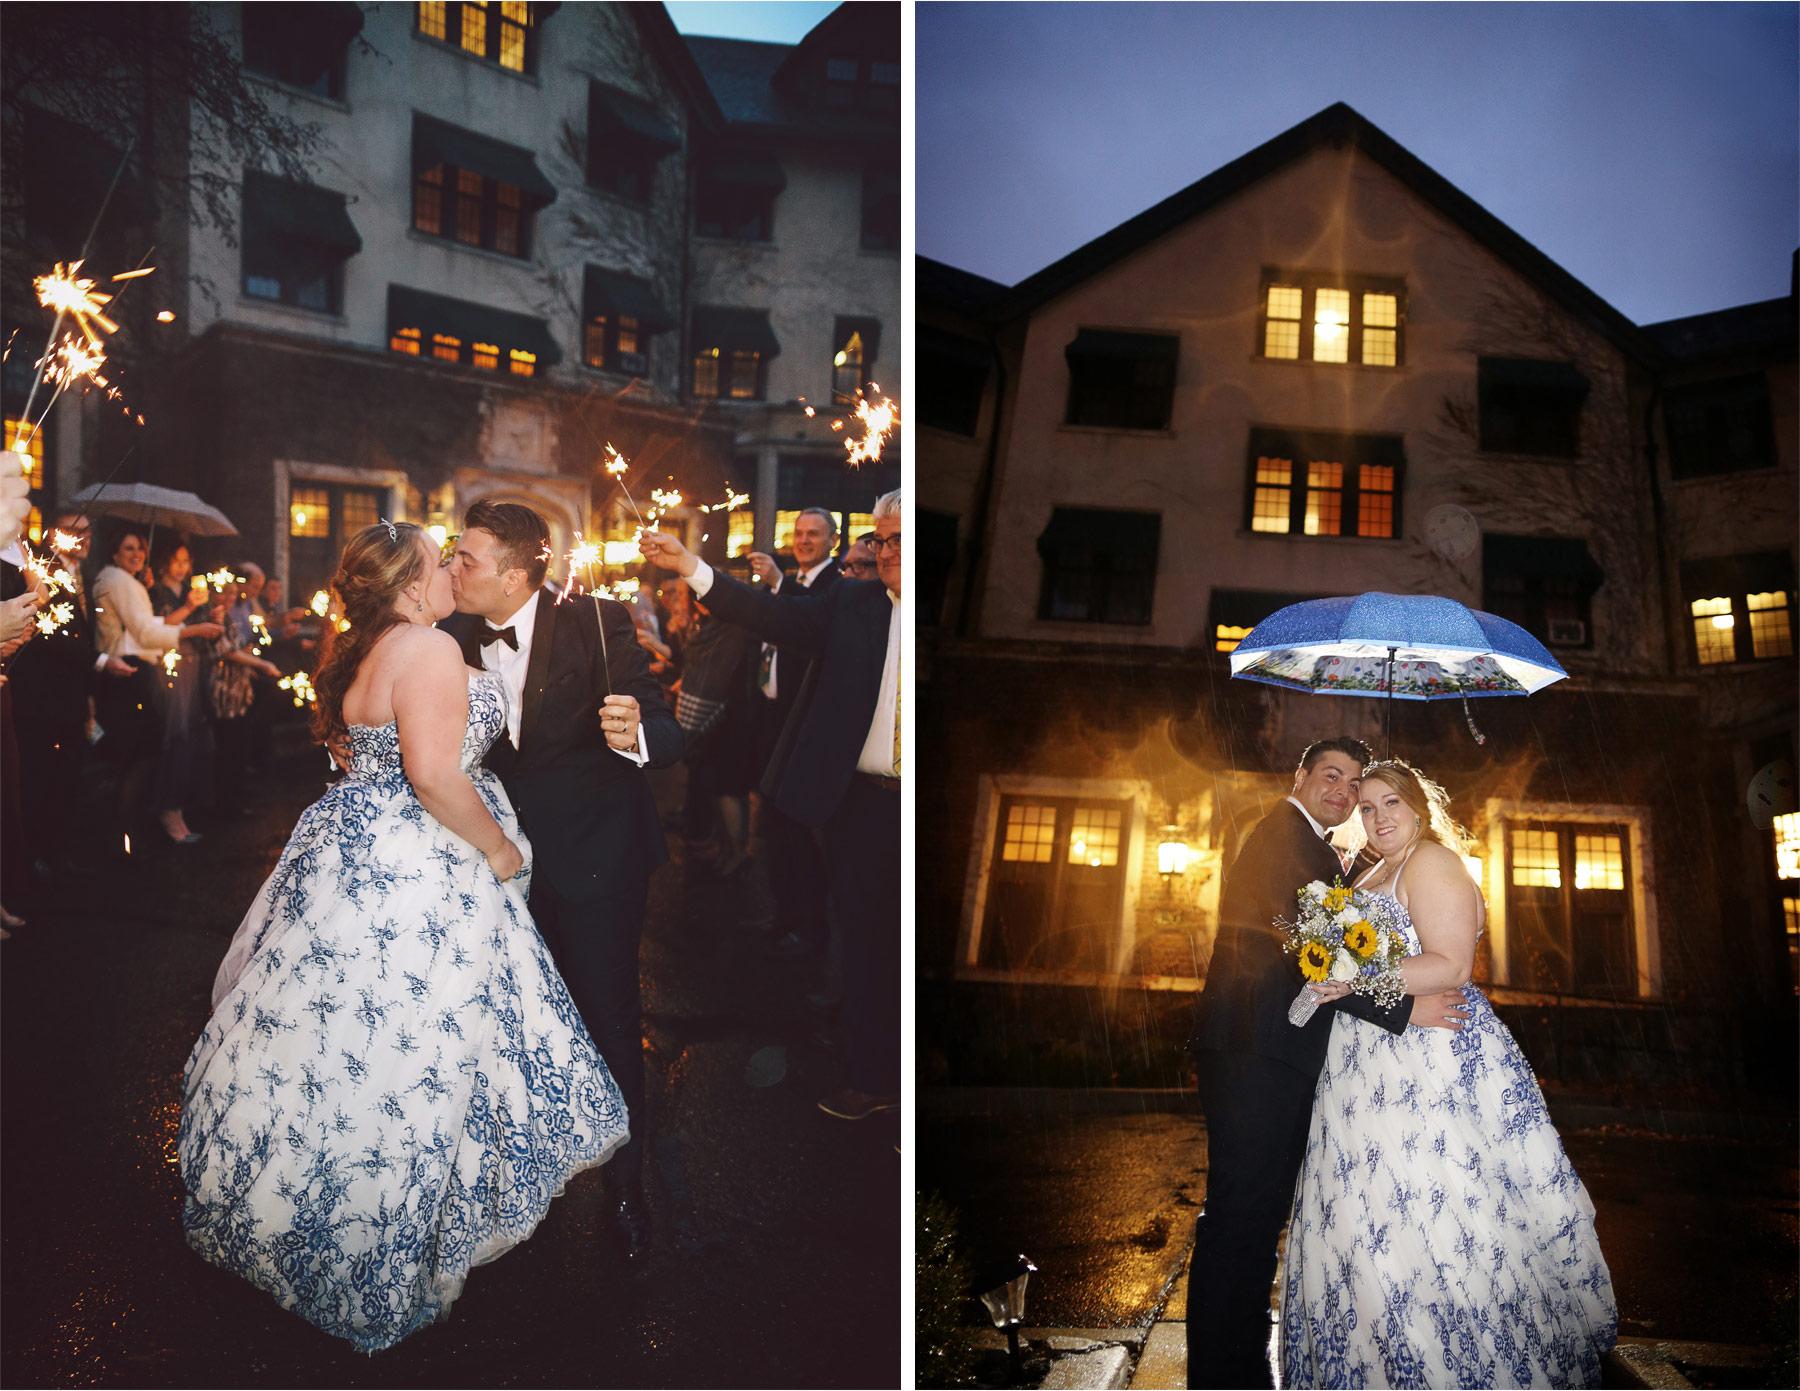 10-Saint-Paul-Minnesota-Wedding-Photography-by-Vick-Photography-The-University-Club-Sparklers-Send-Off-Mari-and-Giuseppe.jpg